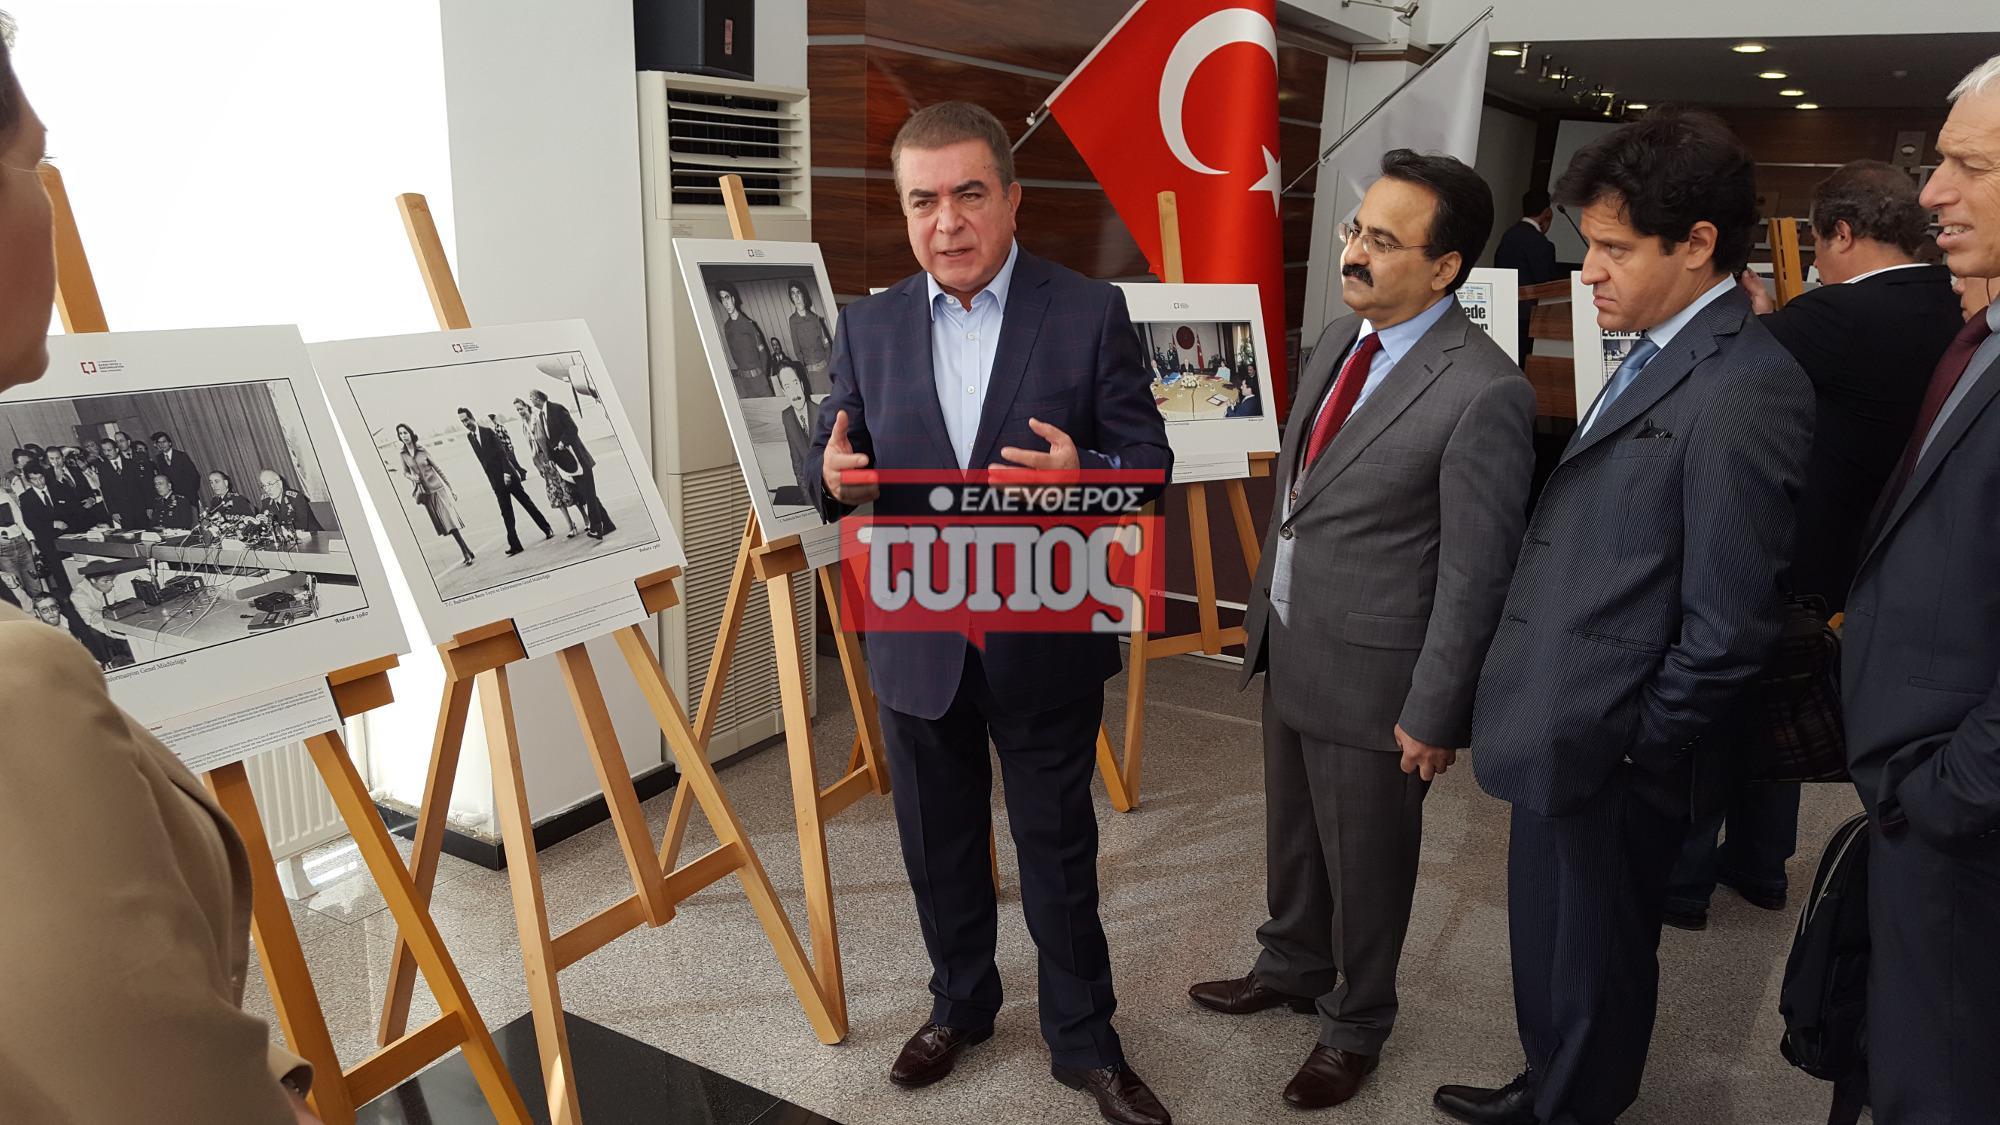 kostidis-agkyra-erdogan-11300 Η Τουρκία μετά το πραξικόπημα: Οι χιλιάδες συλλήψεις και... ο χωρισμός Πιτ-Τζολί